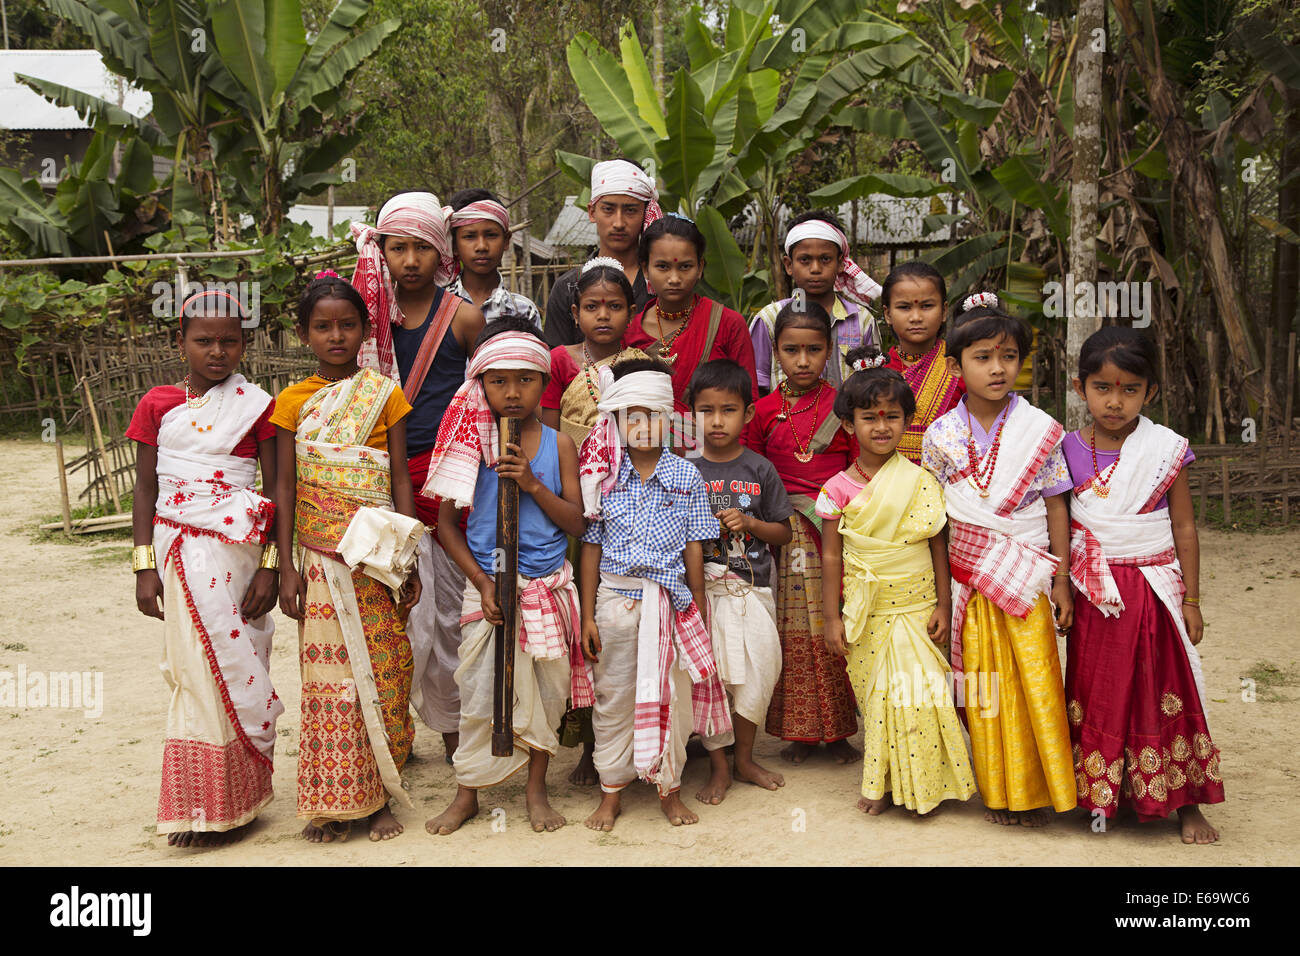 Assam traditional dress images